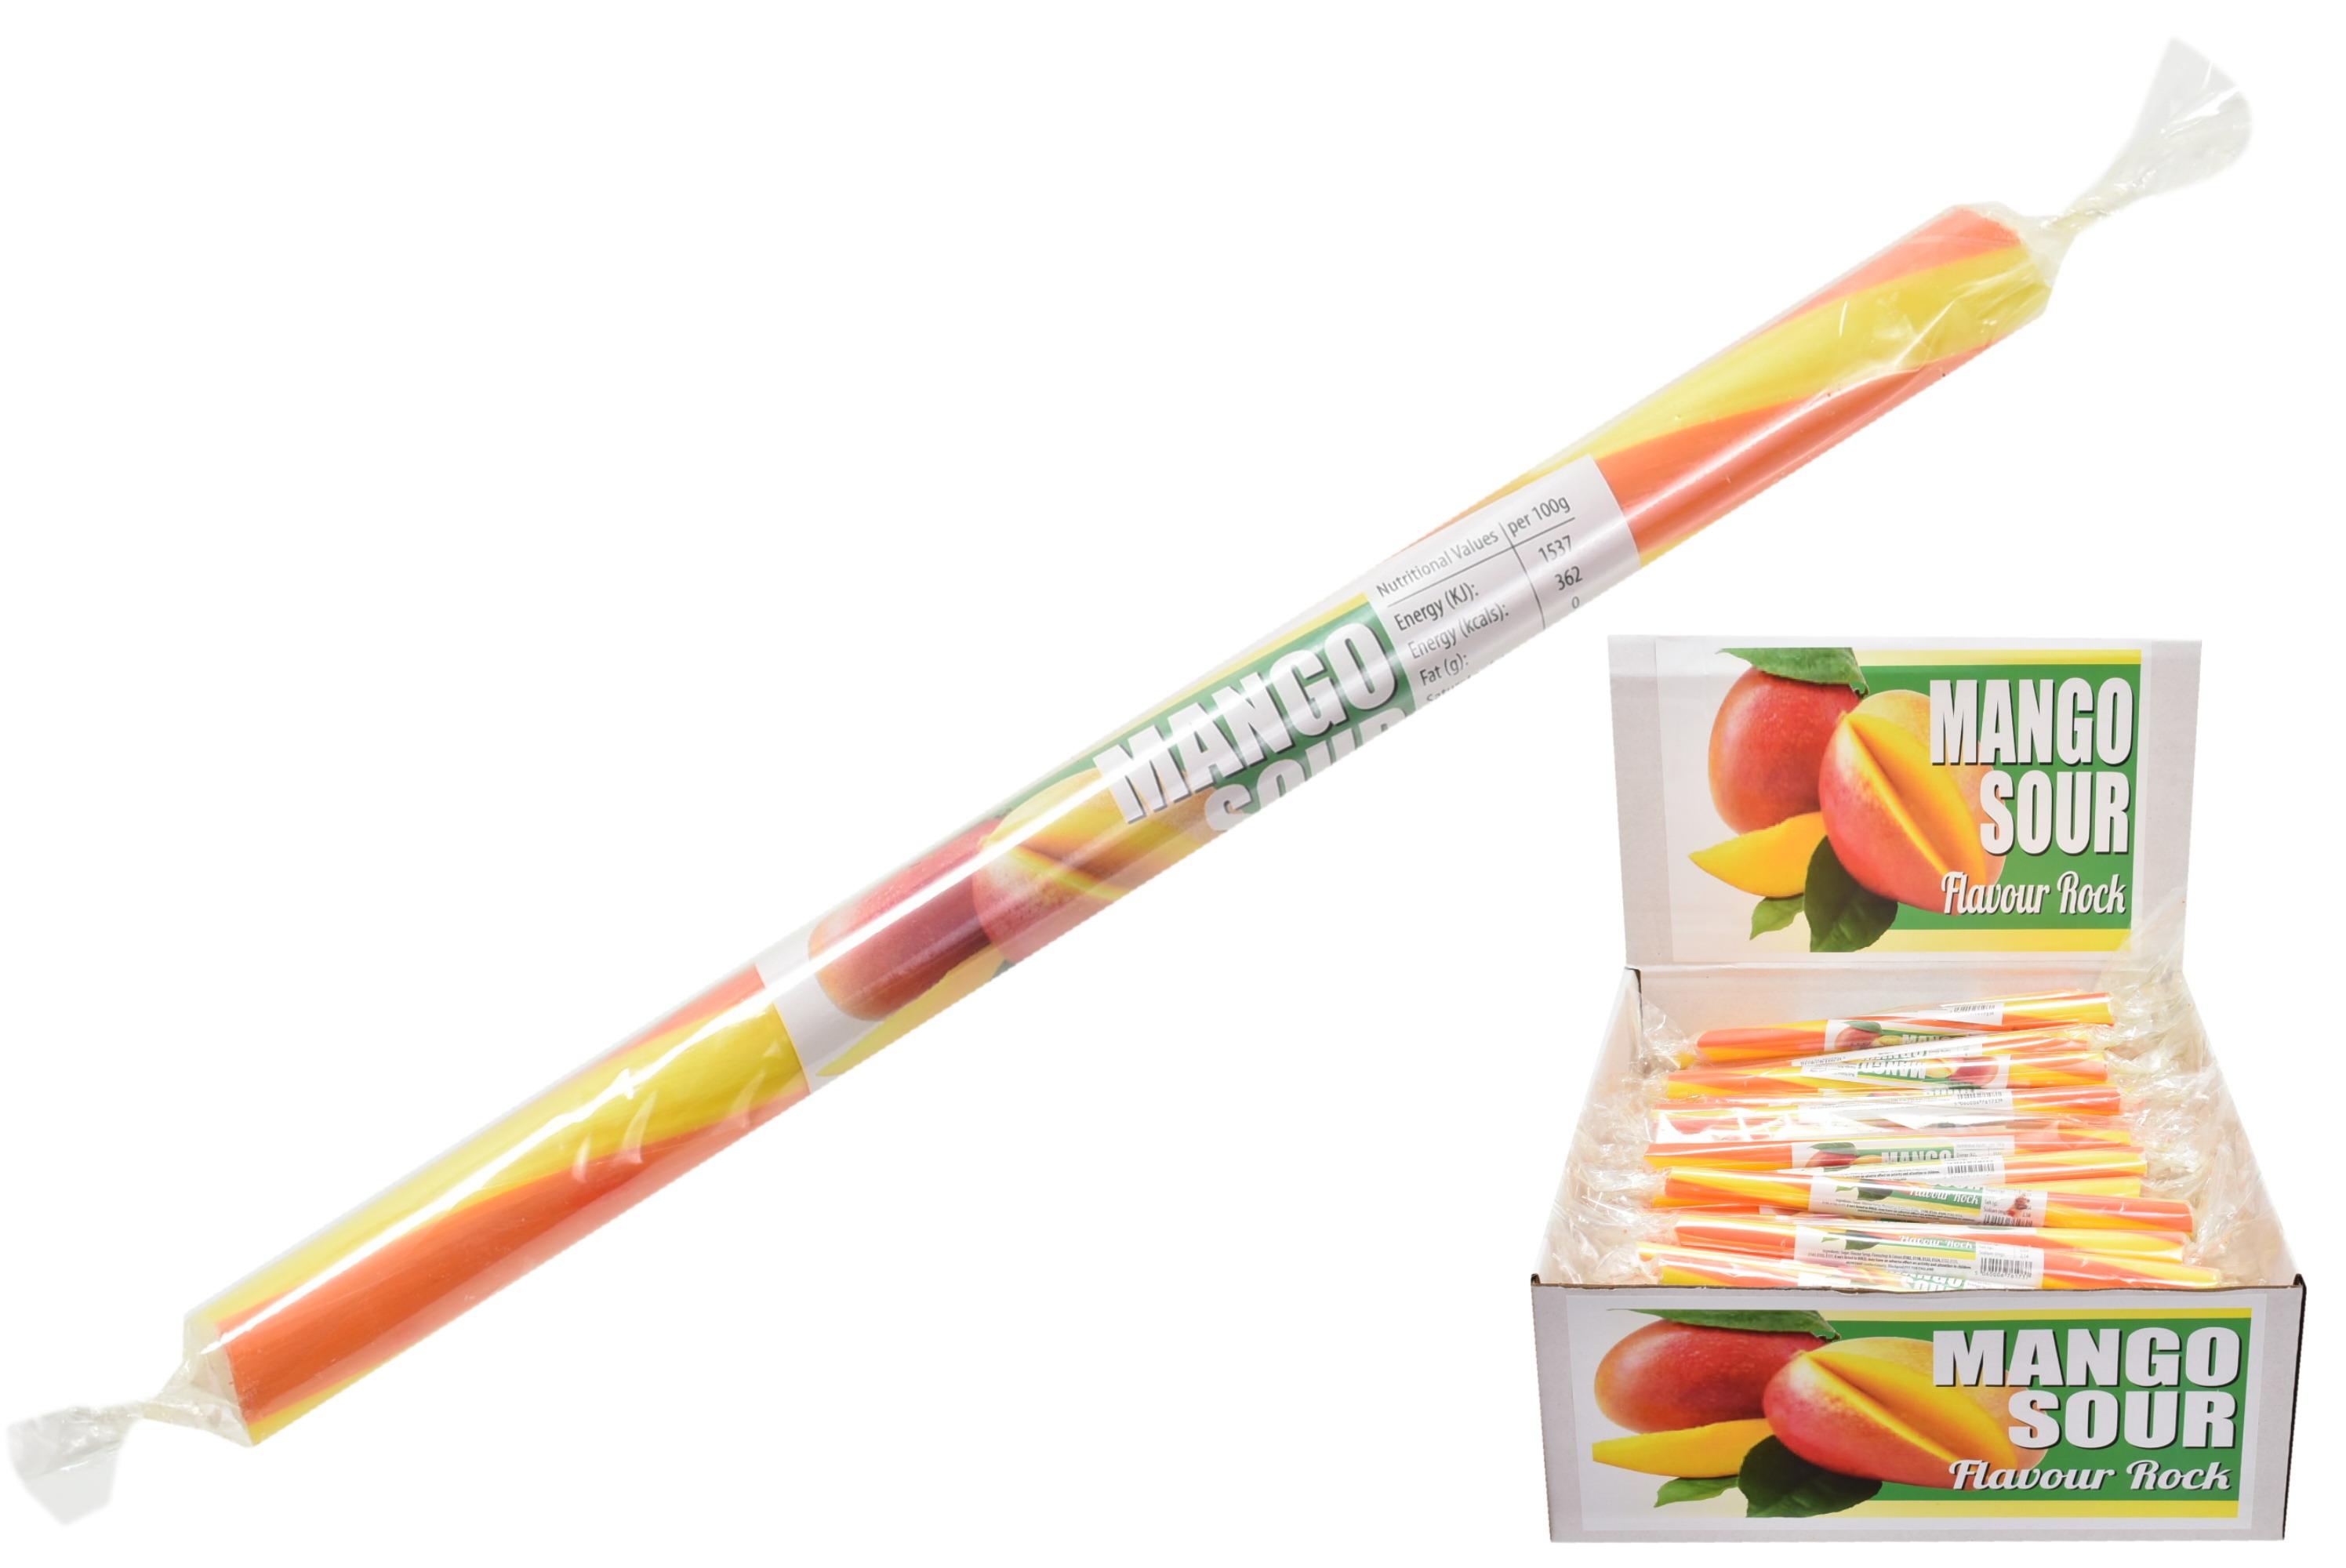 Mango Sour Flavoured Rock Sticks In Display Box